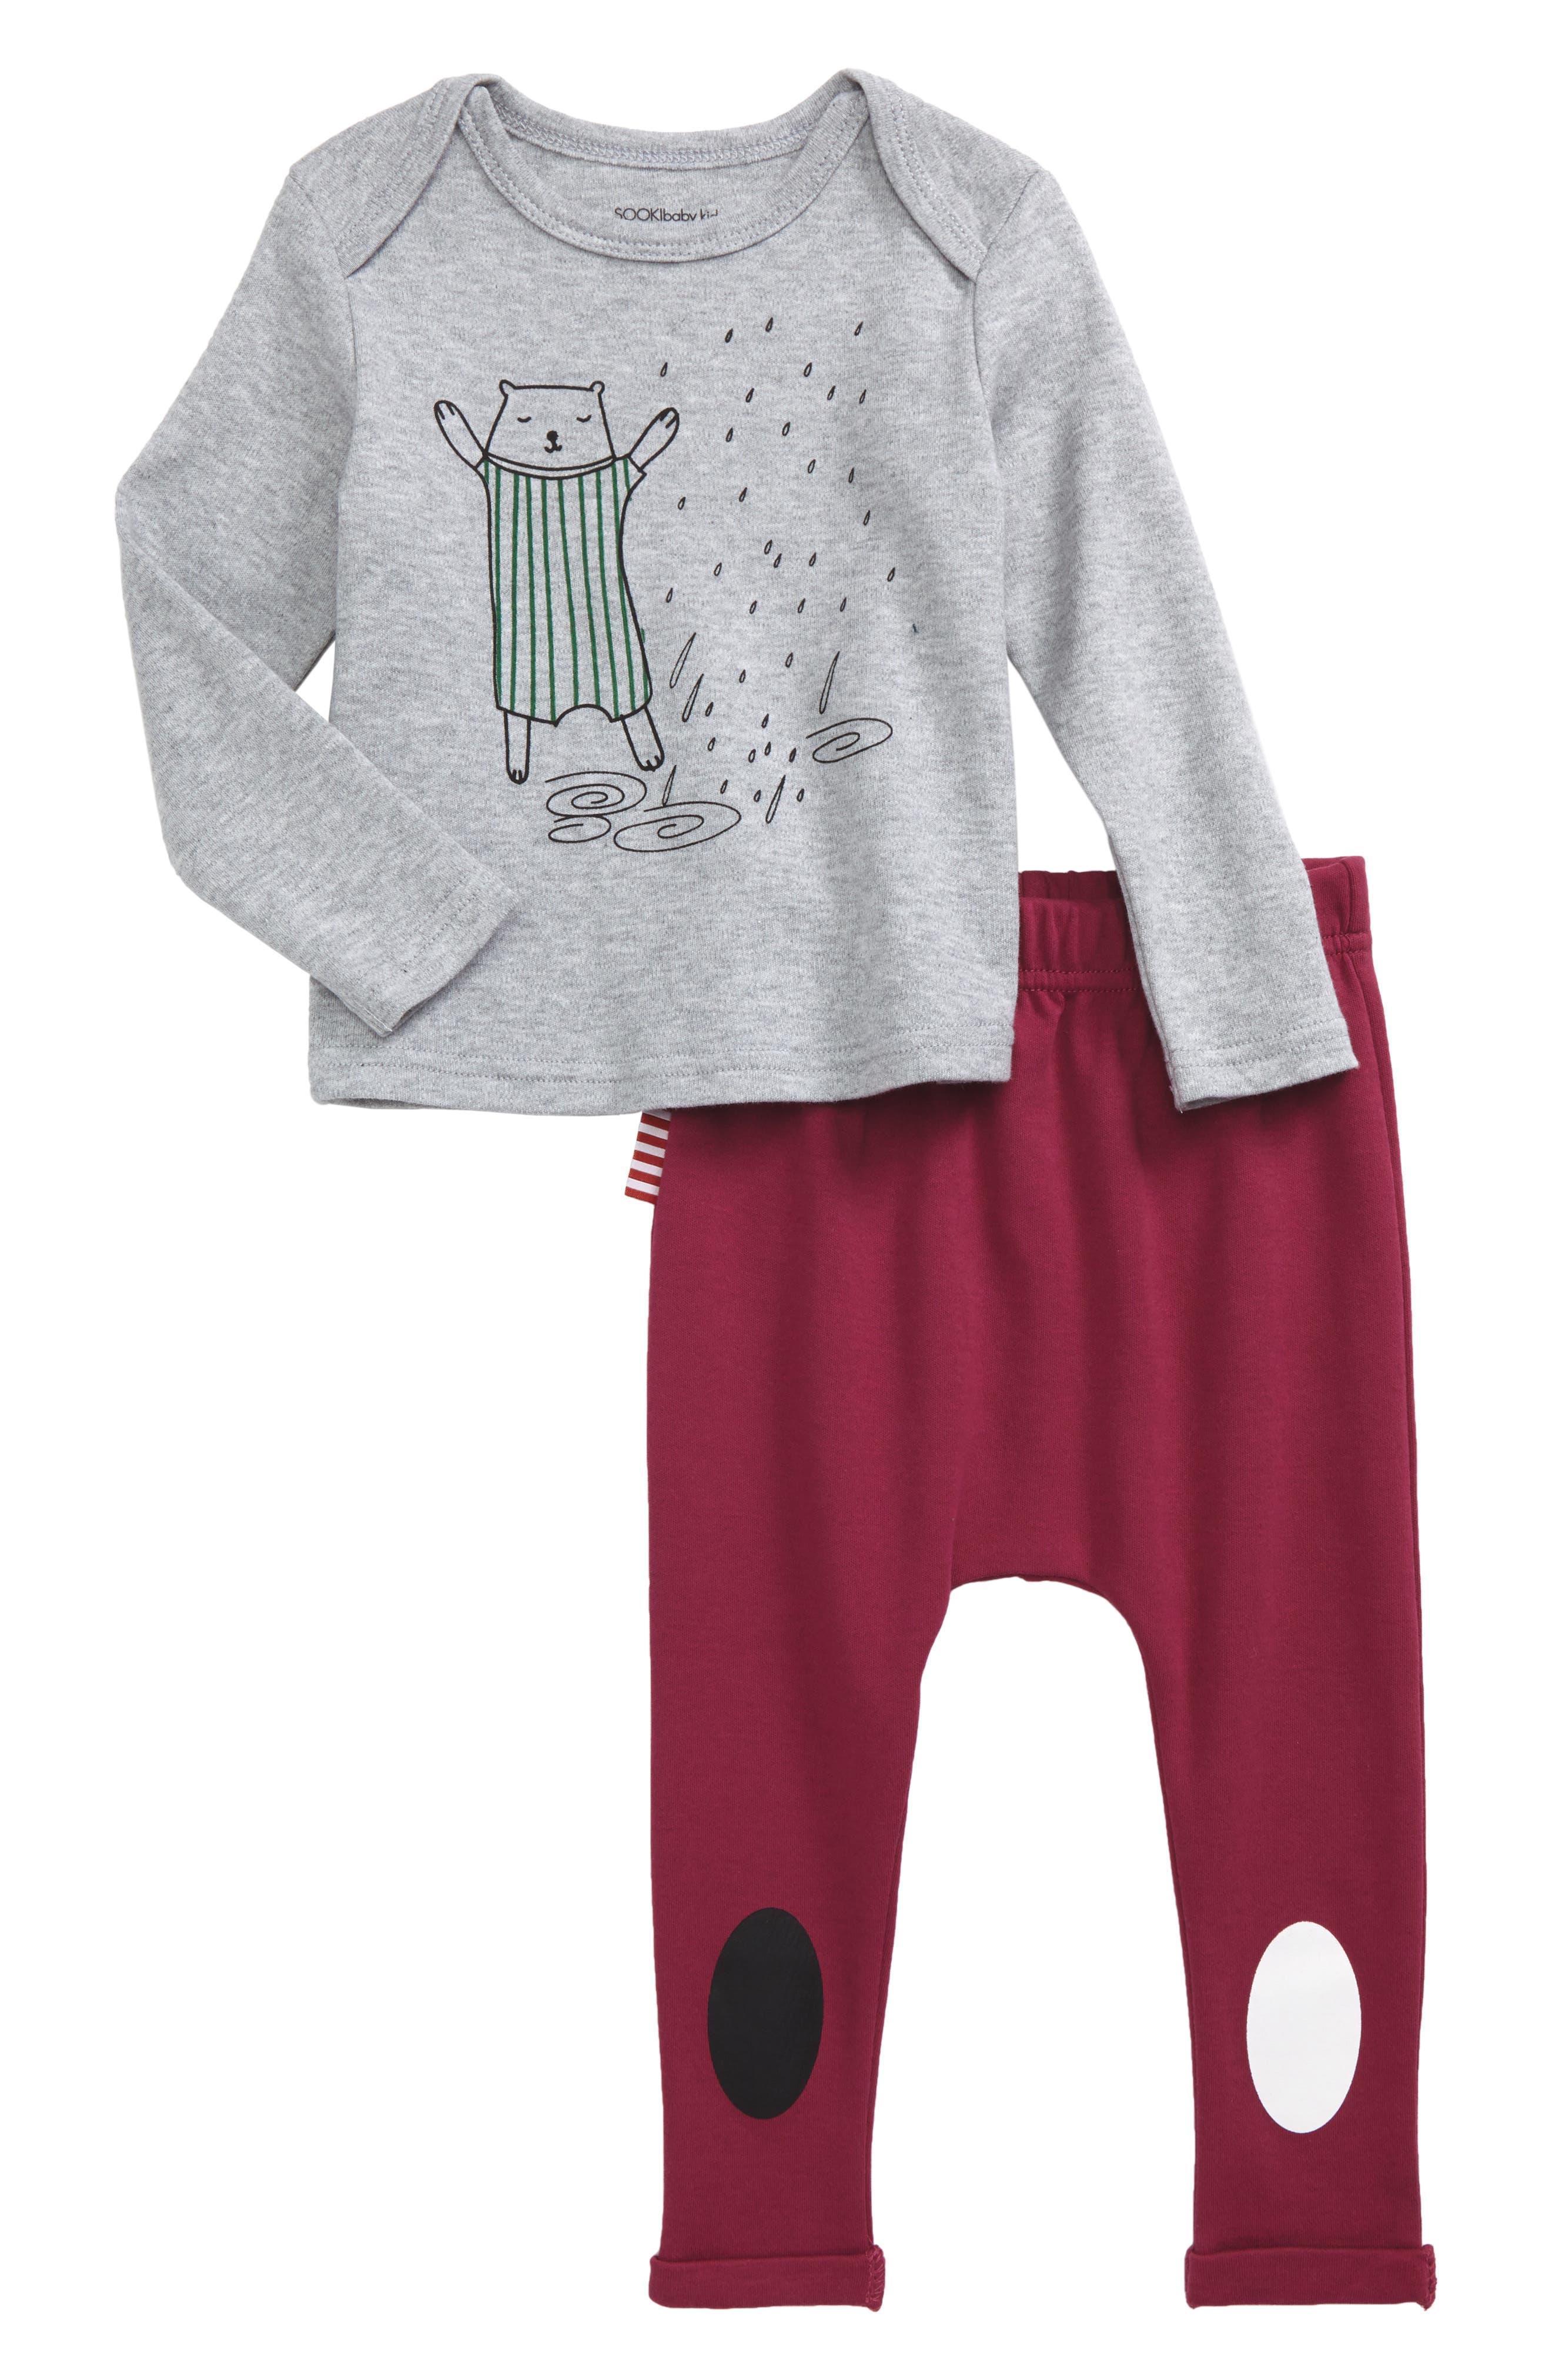 SOOKIbaby Christmas T-Shirt & Pants Set (Baby)